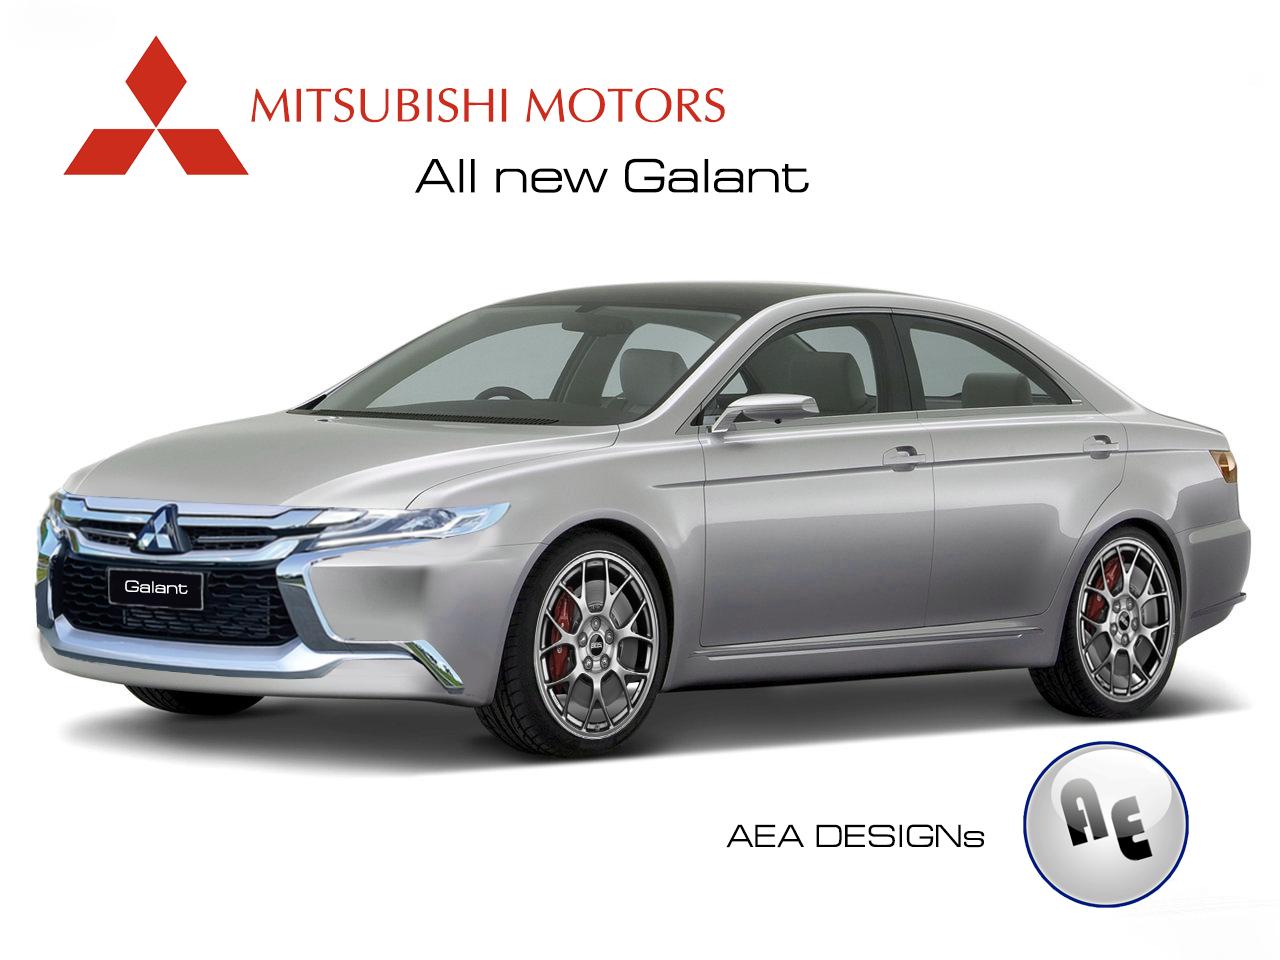 Mitsubishi Wiring Harness Stereo Not Lossing Diagram Mercedes Sl Car Cd Player Installation Montero Outlander